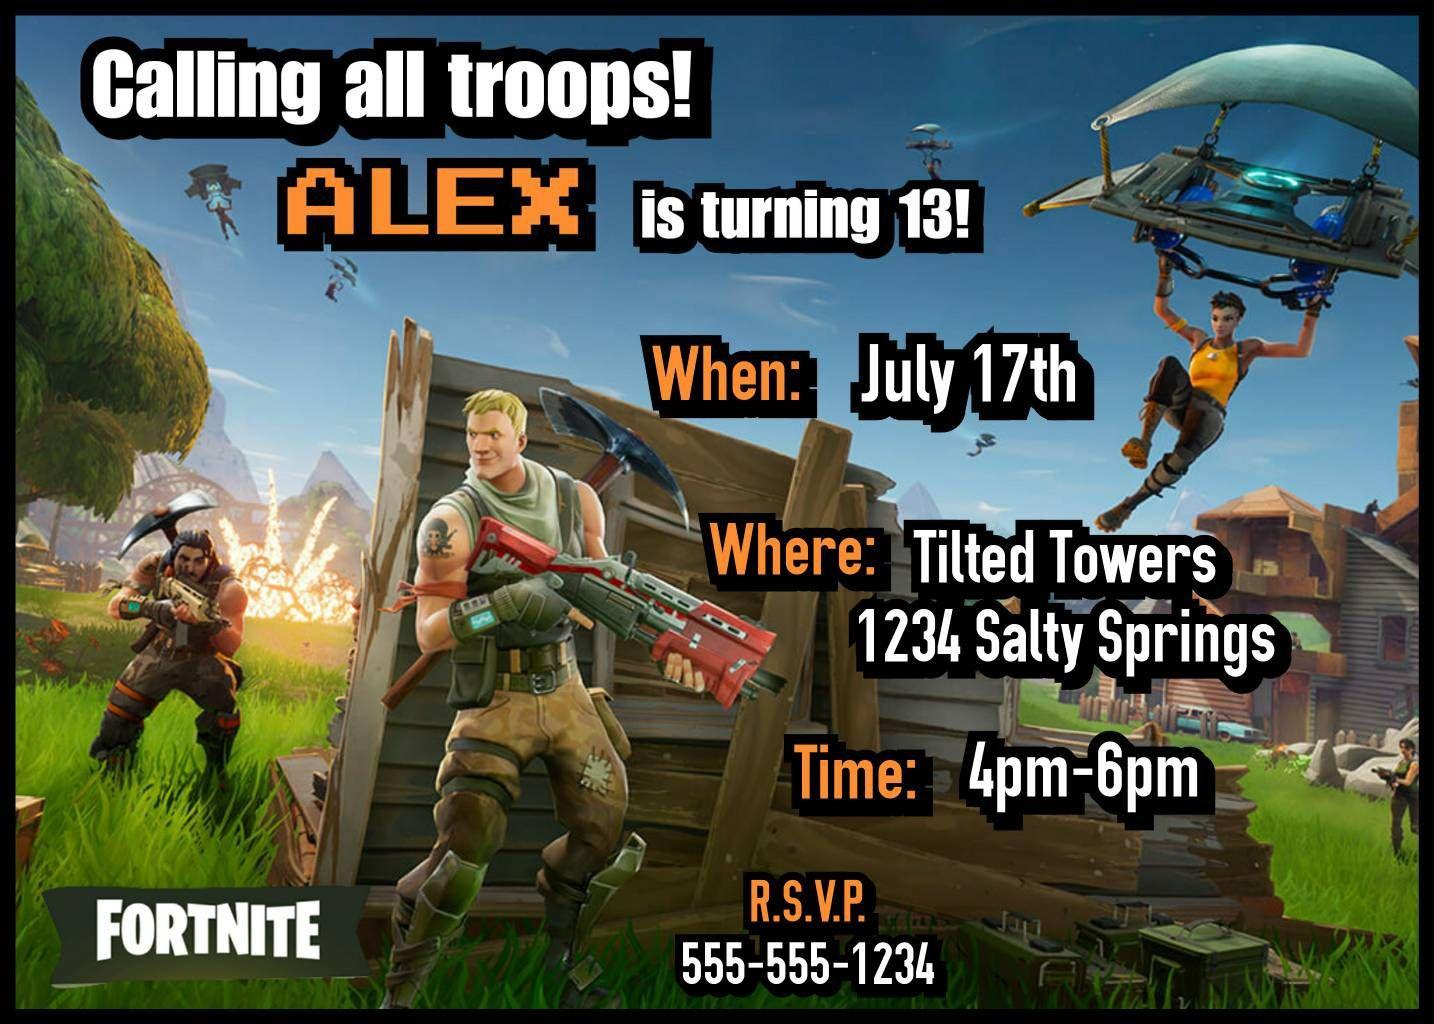 Fortnite Party Invitations Invitationsbykasey Etsy Com